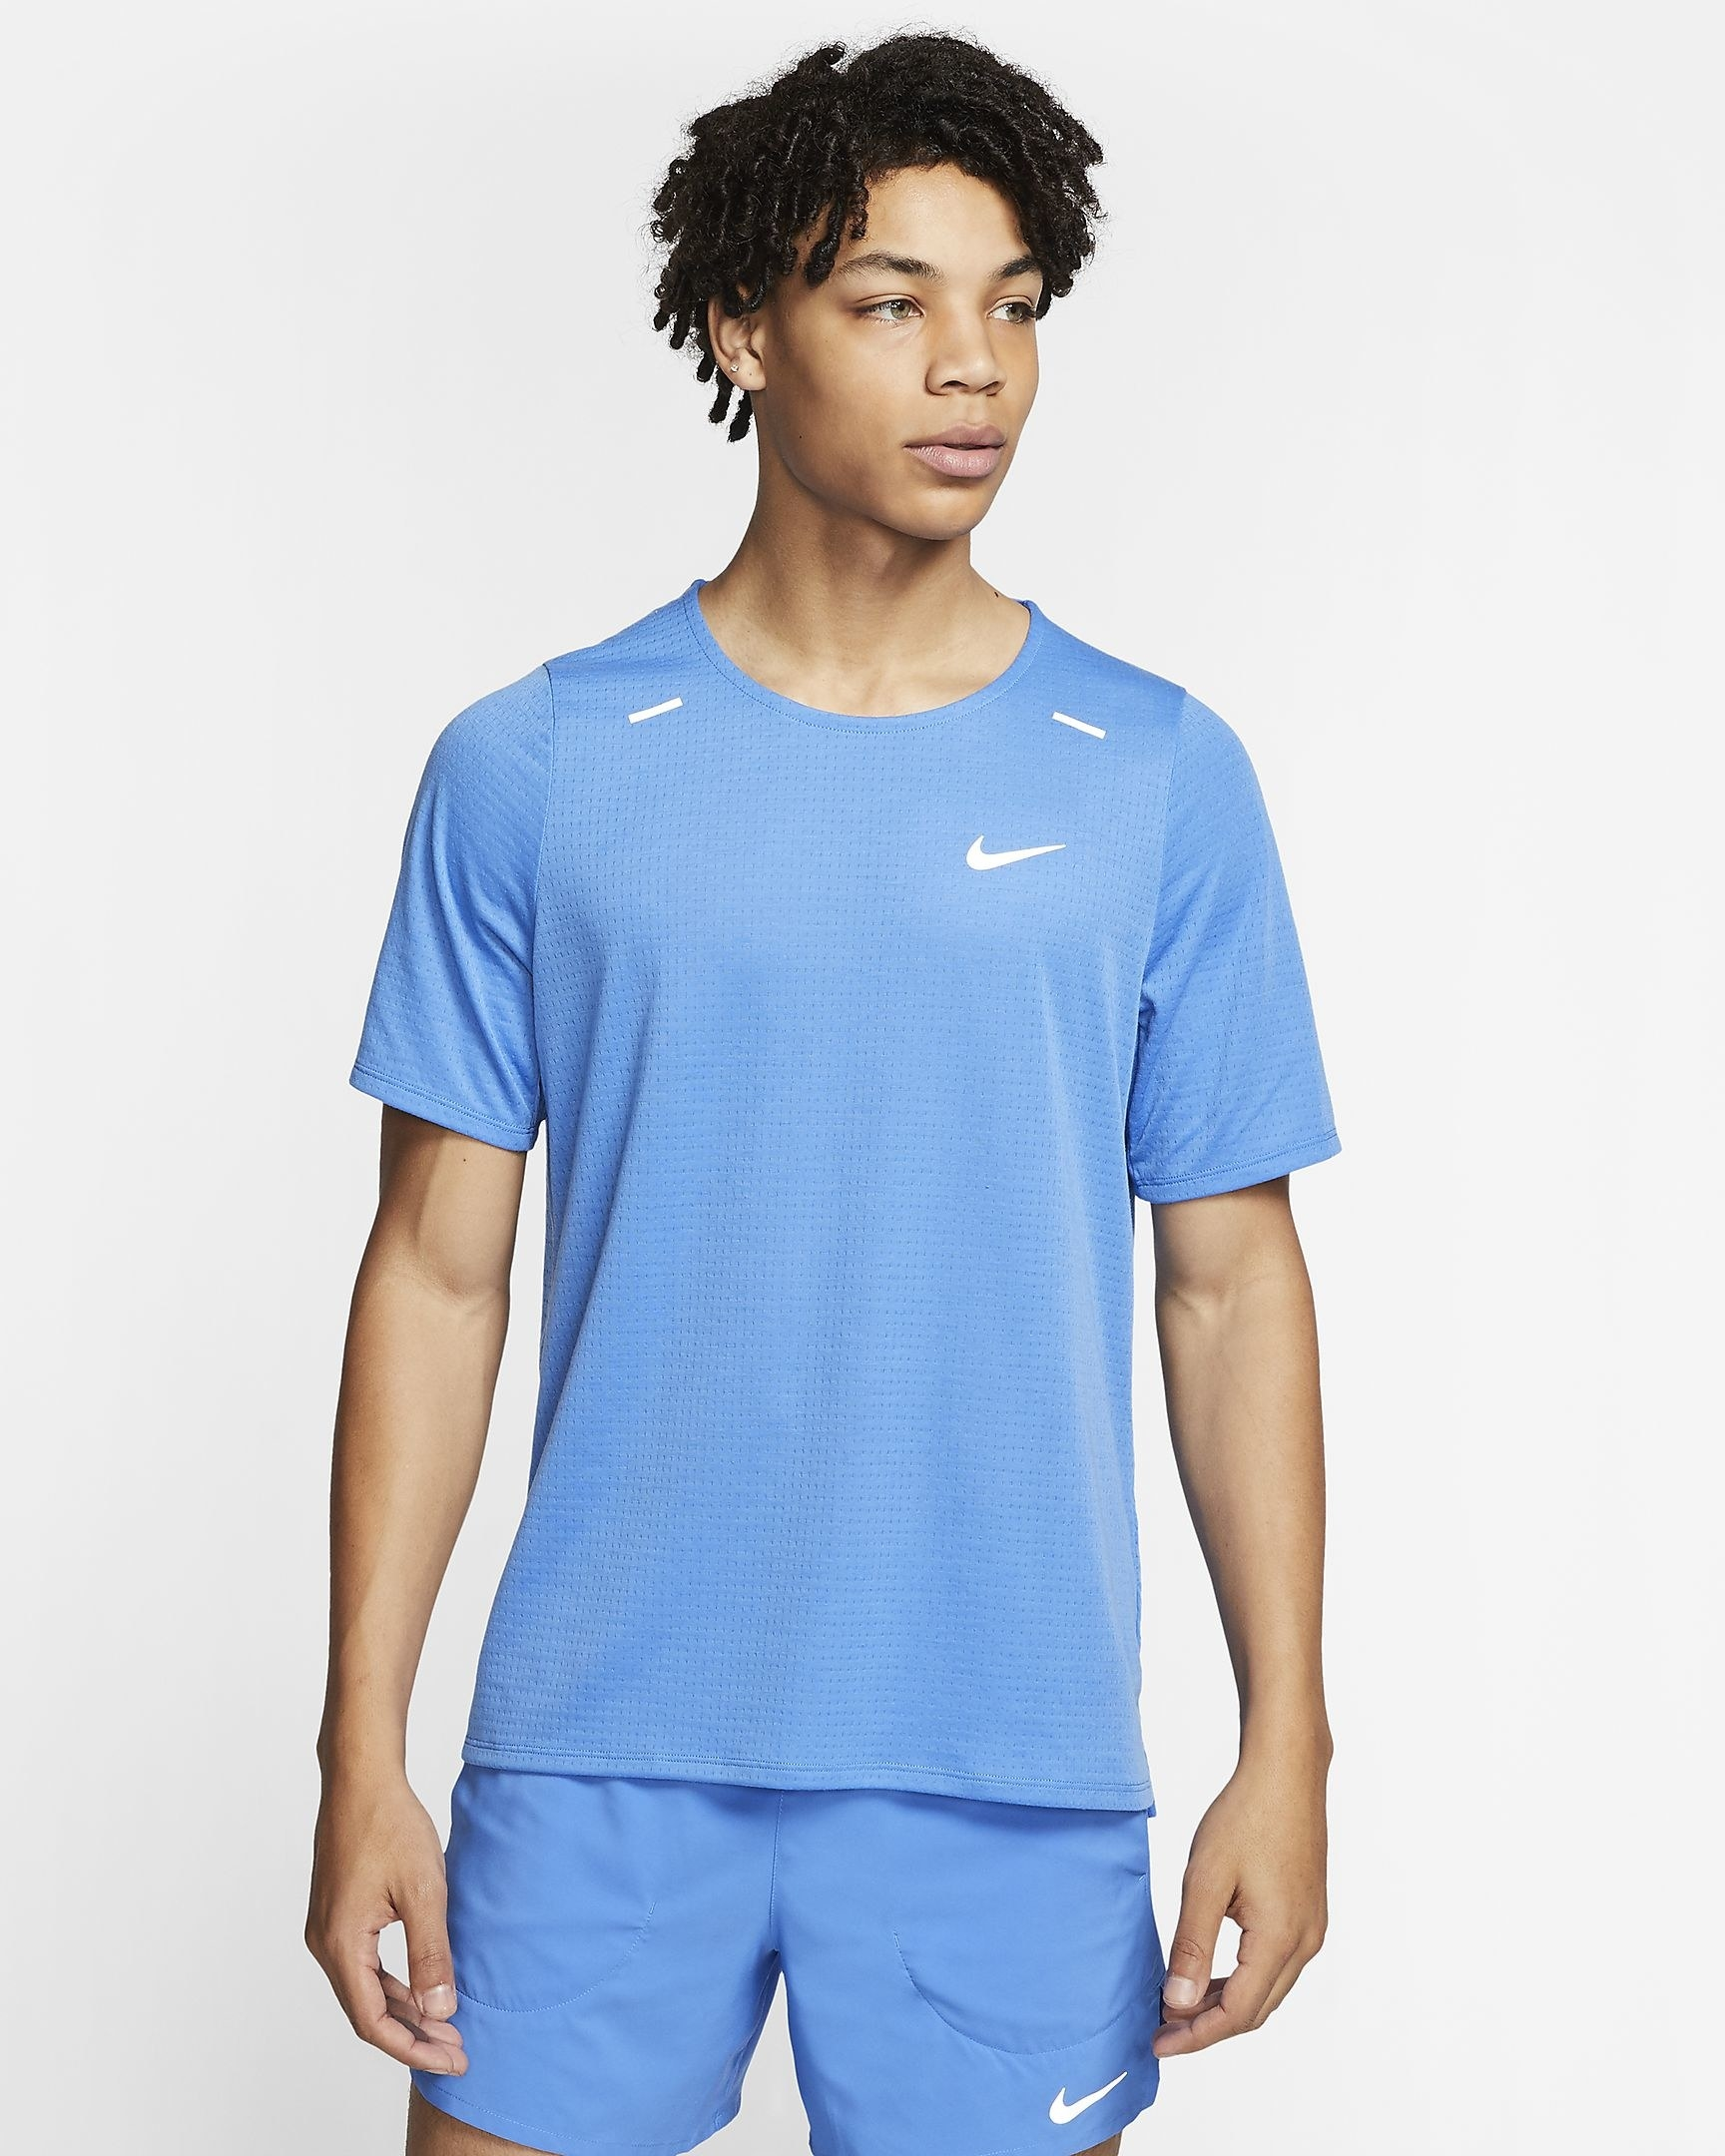 model wearing the blue shirt